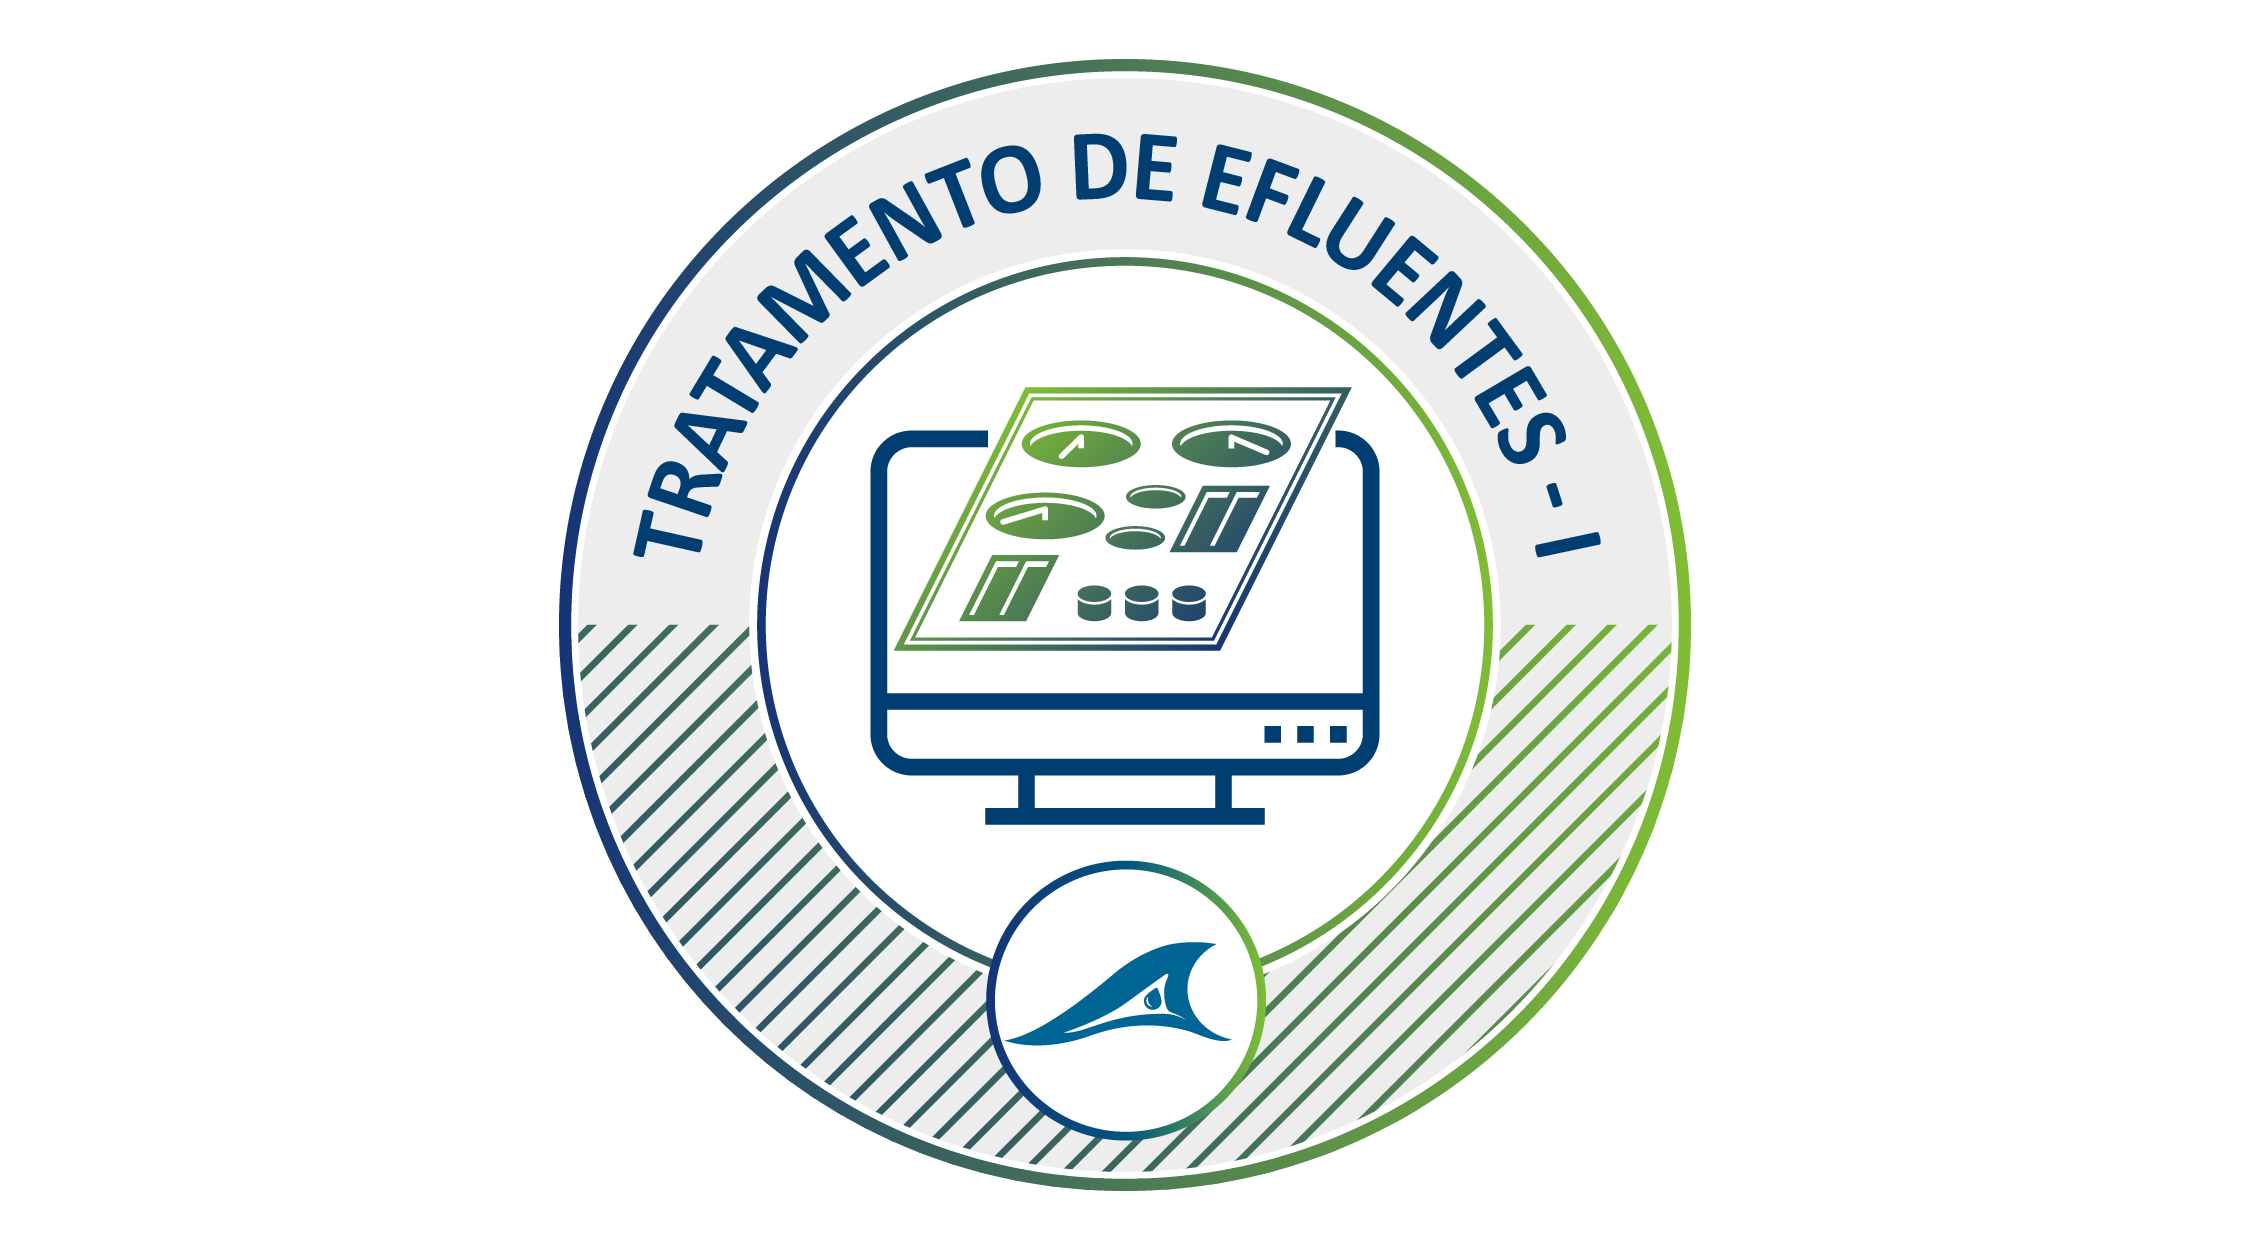 Logo curso online semfundo 01%2b 1